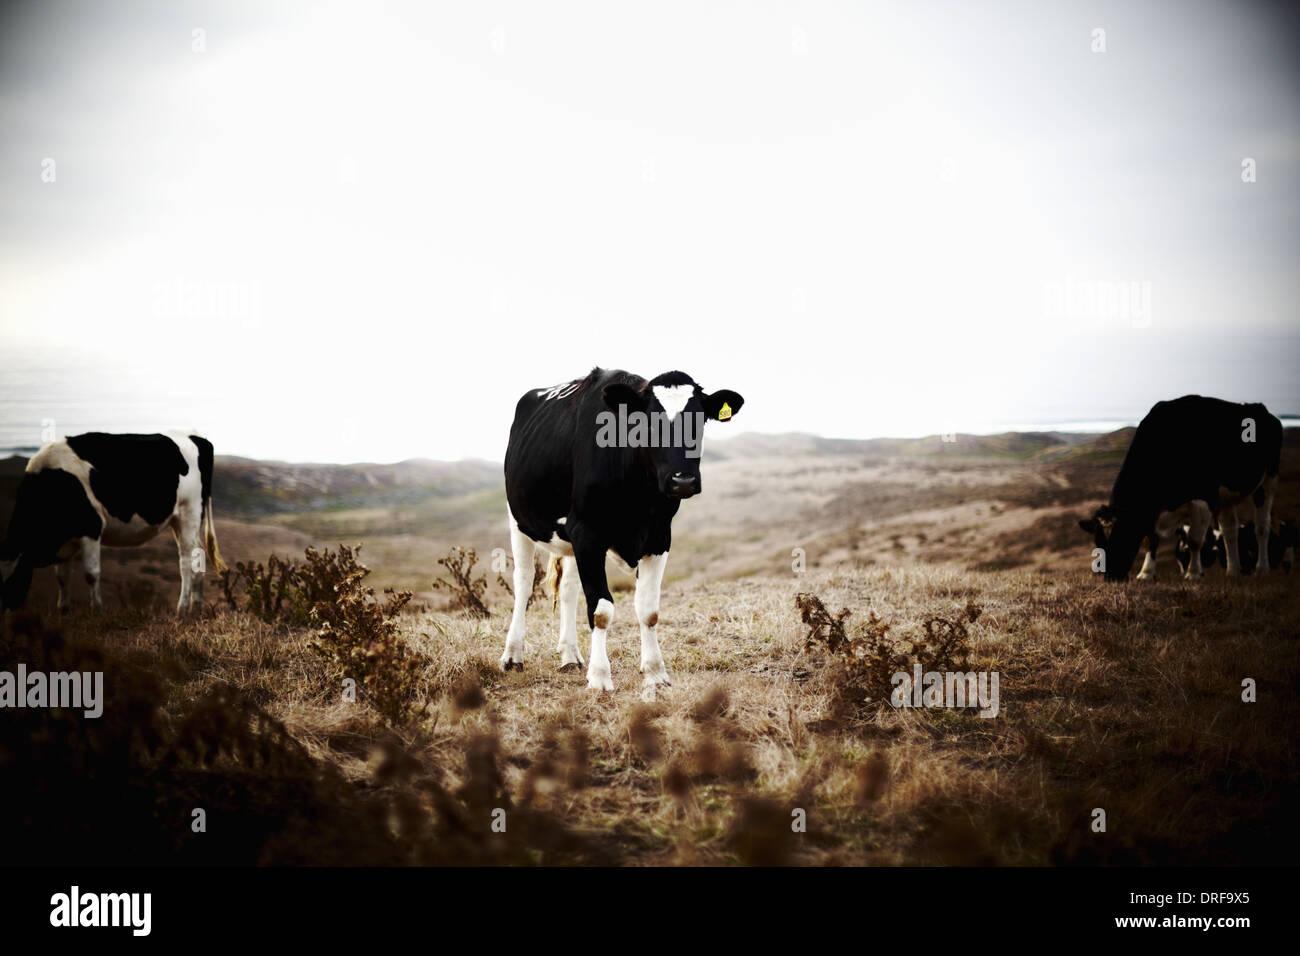 USA Three cows on grazing land - Stock Image